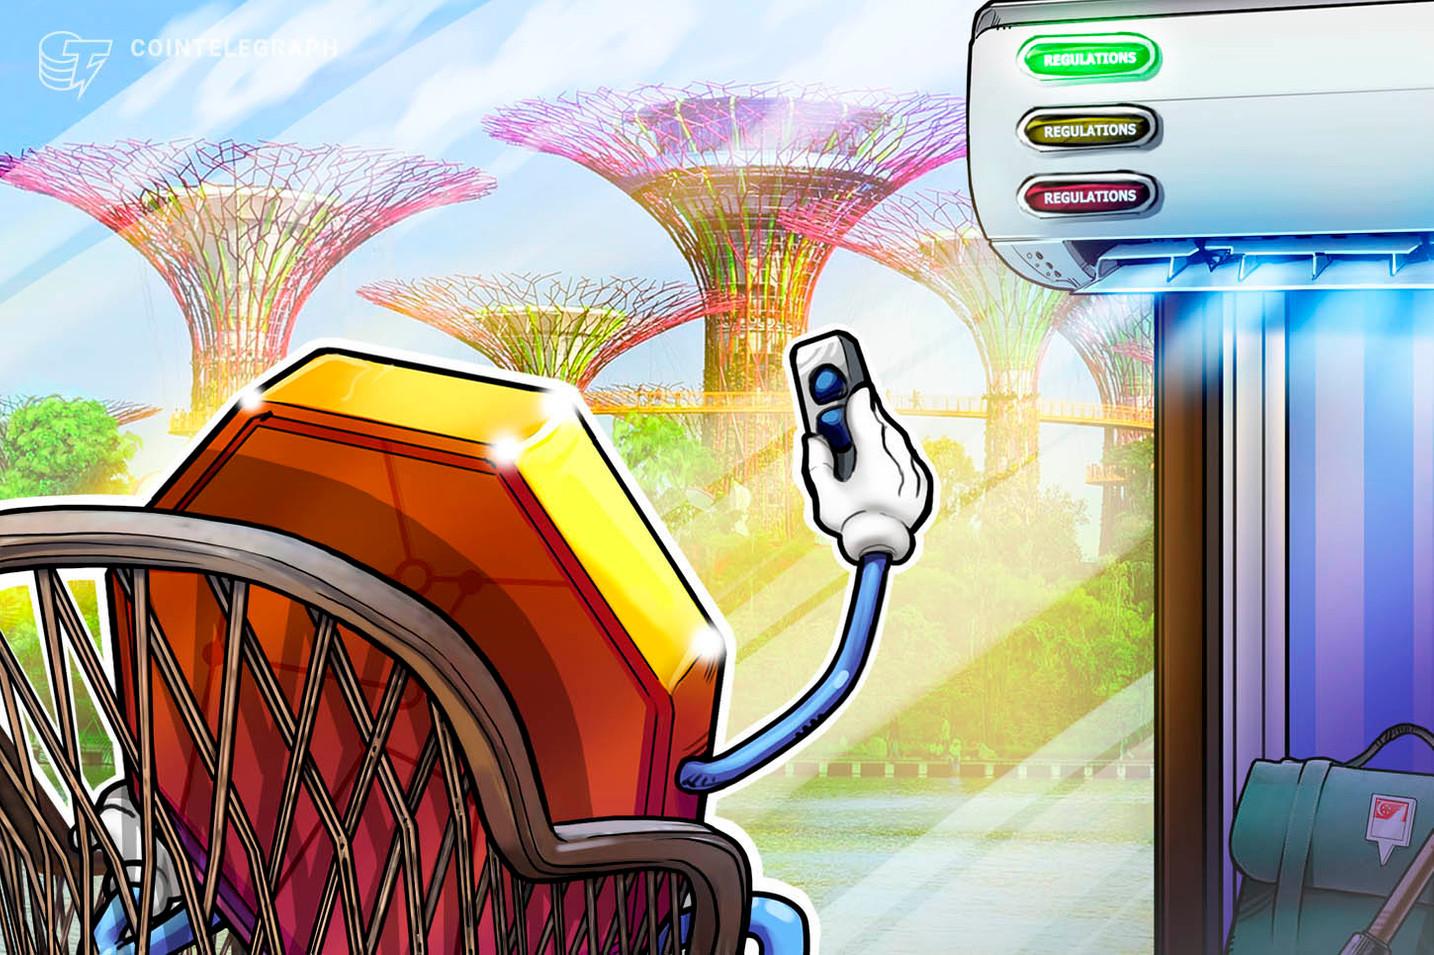 Singapore: Crypto Derivatives Set to Come Under Regulatory Oversight